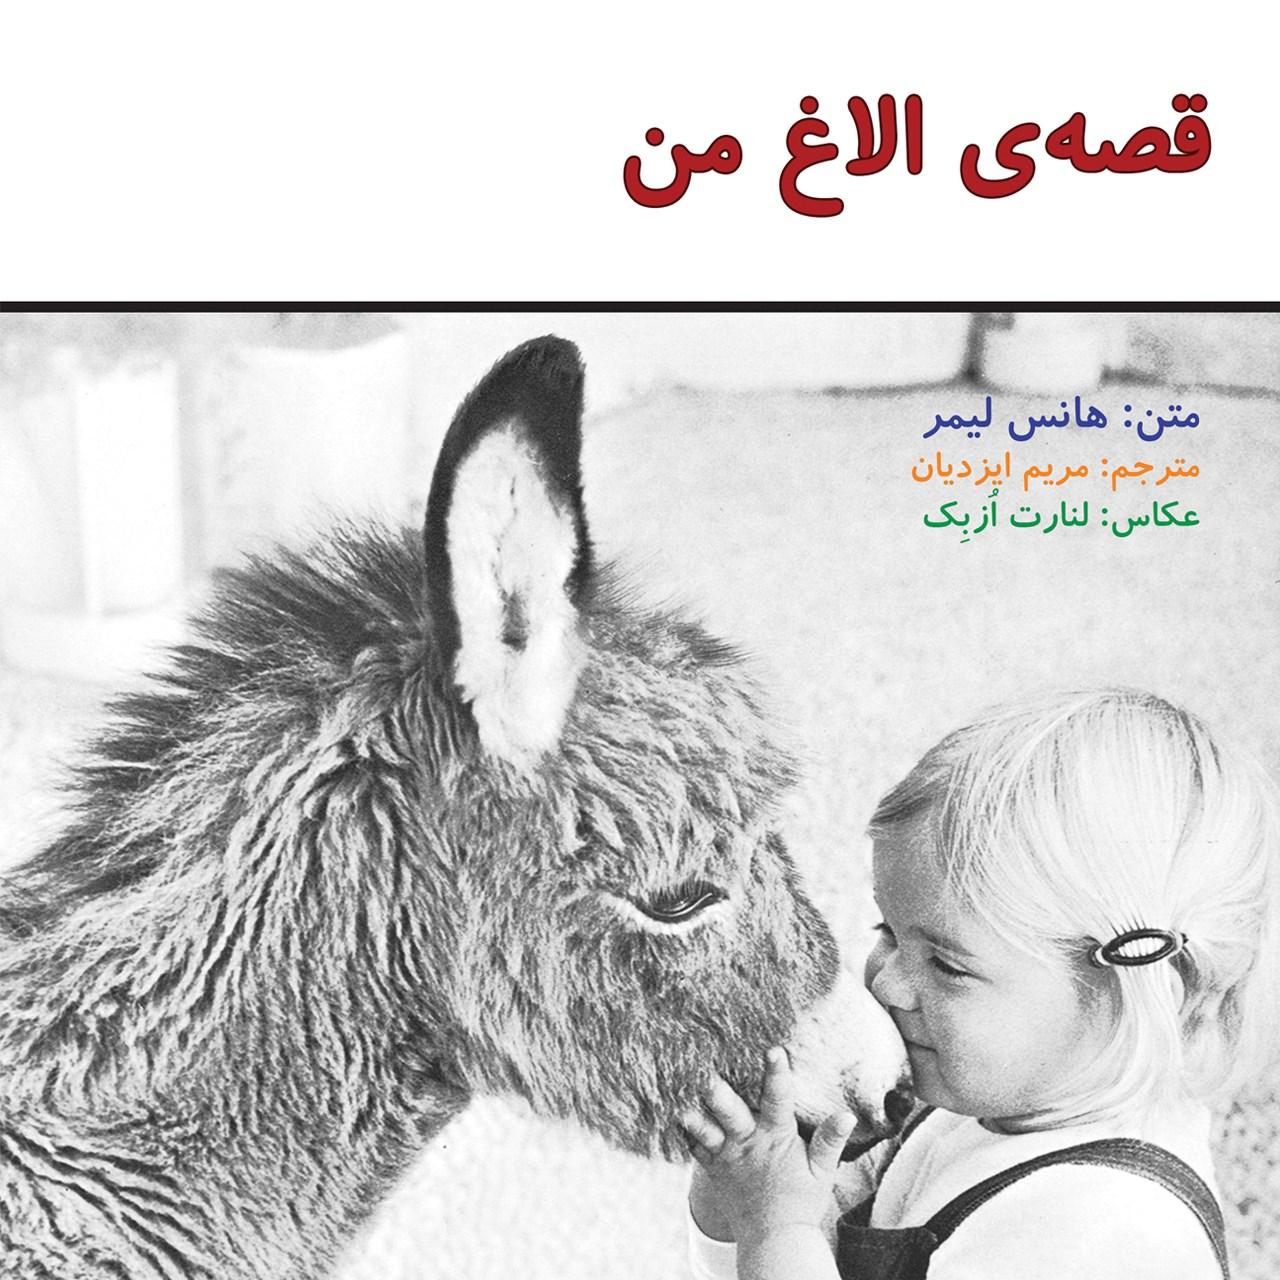 کتاب قصه الاغ من اثر هانس لیمر